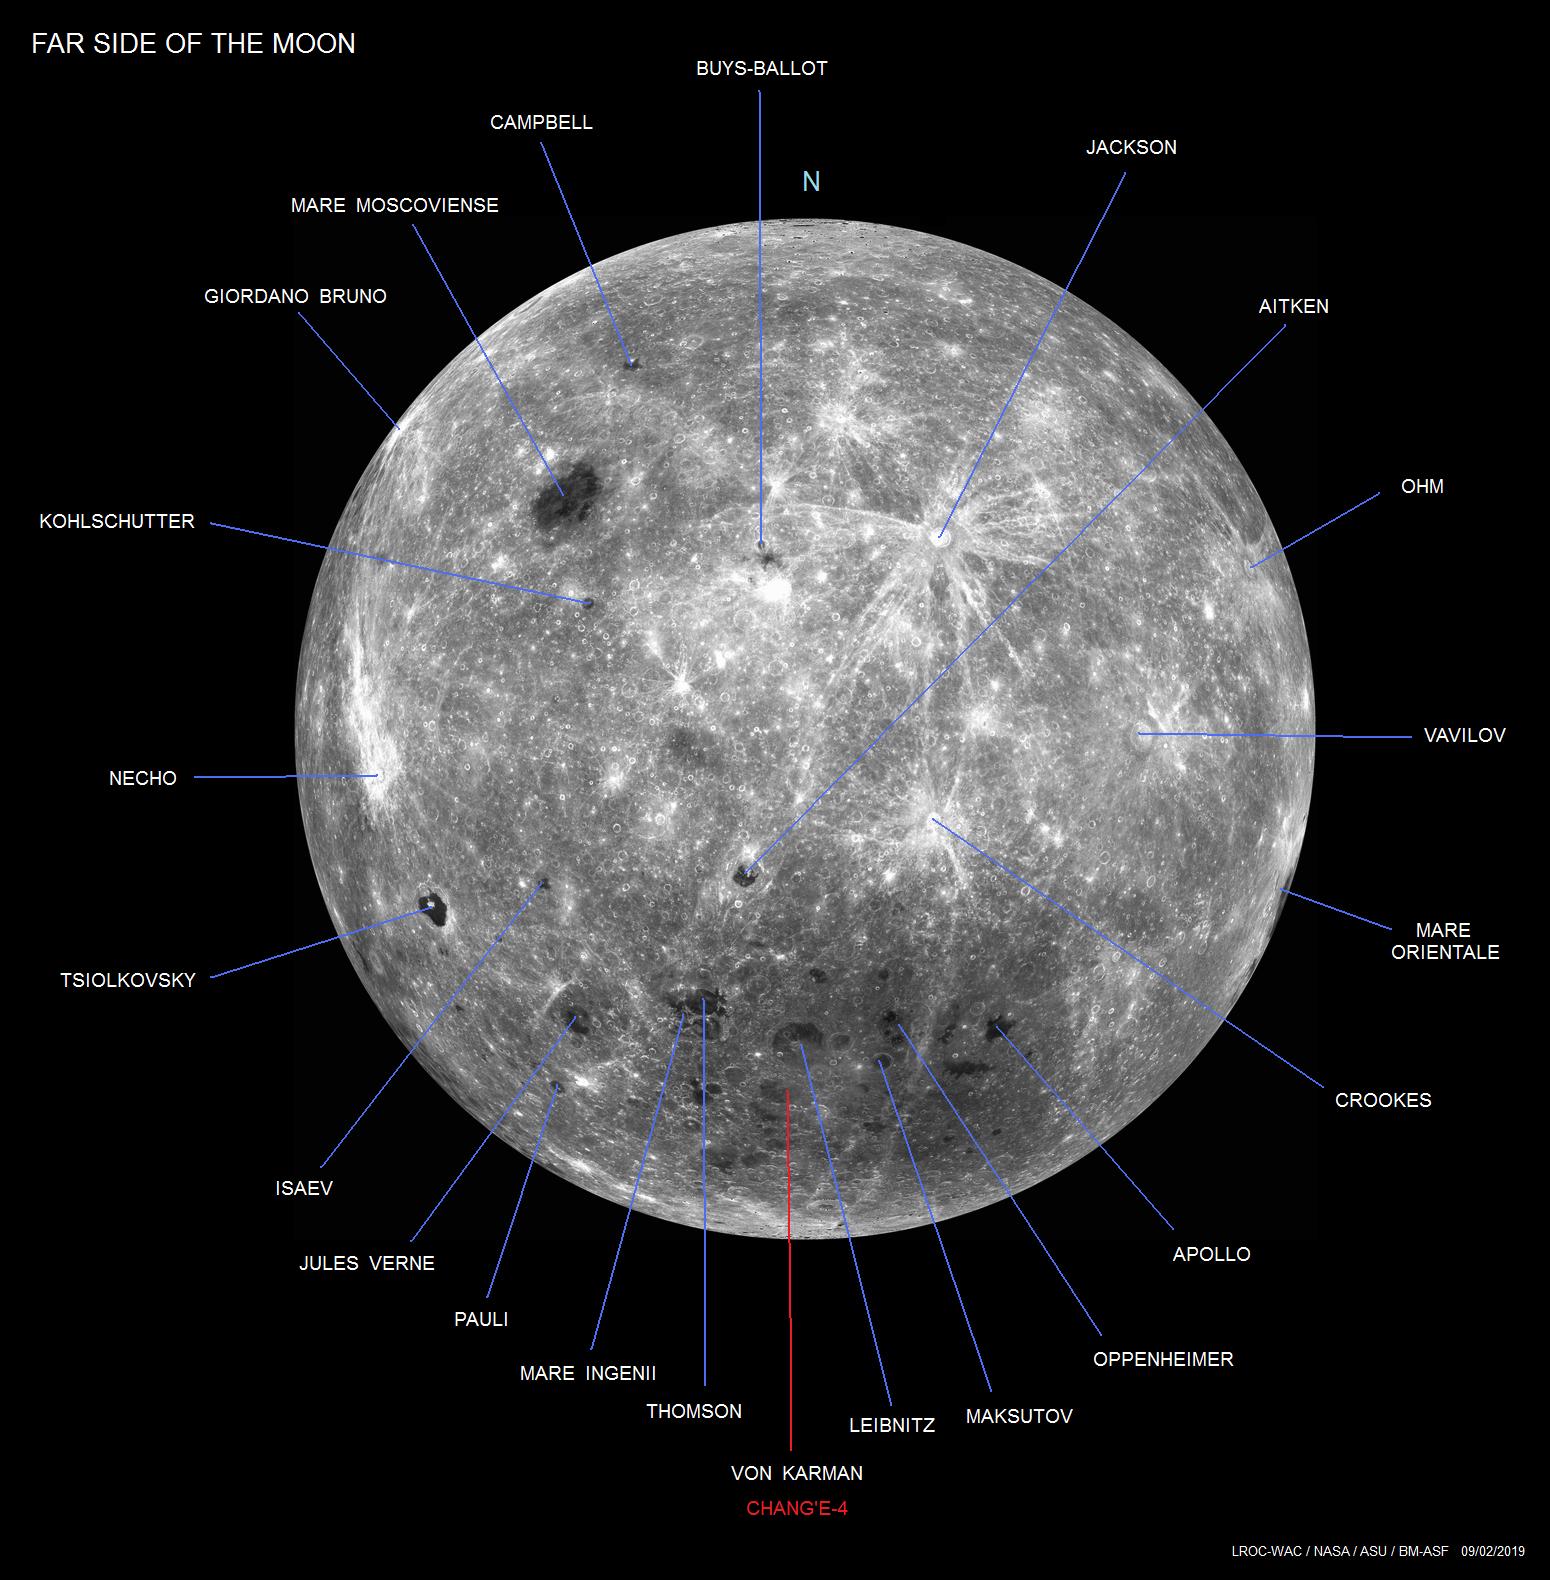 5c5ebfc39480b_Moon_farside_LRO_NB_mosaic_p.png.a67bc9825c8c5a0fa1f4306a8e488fb7.png